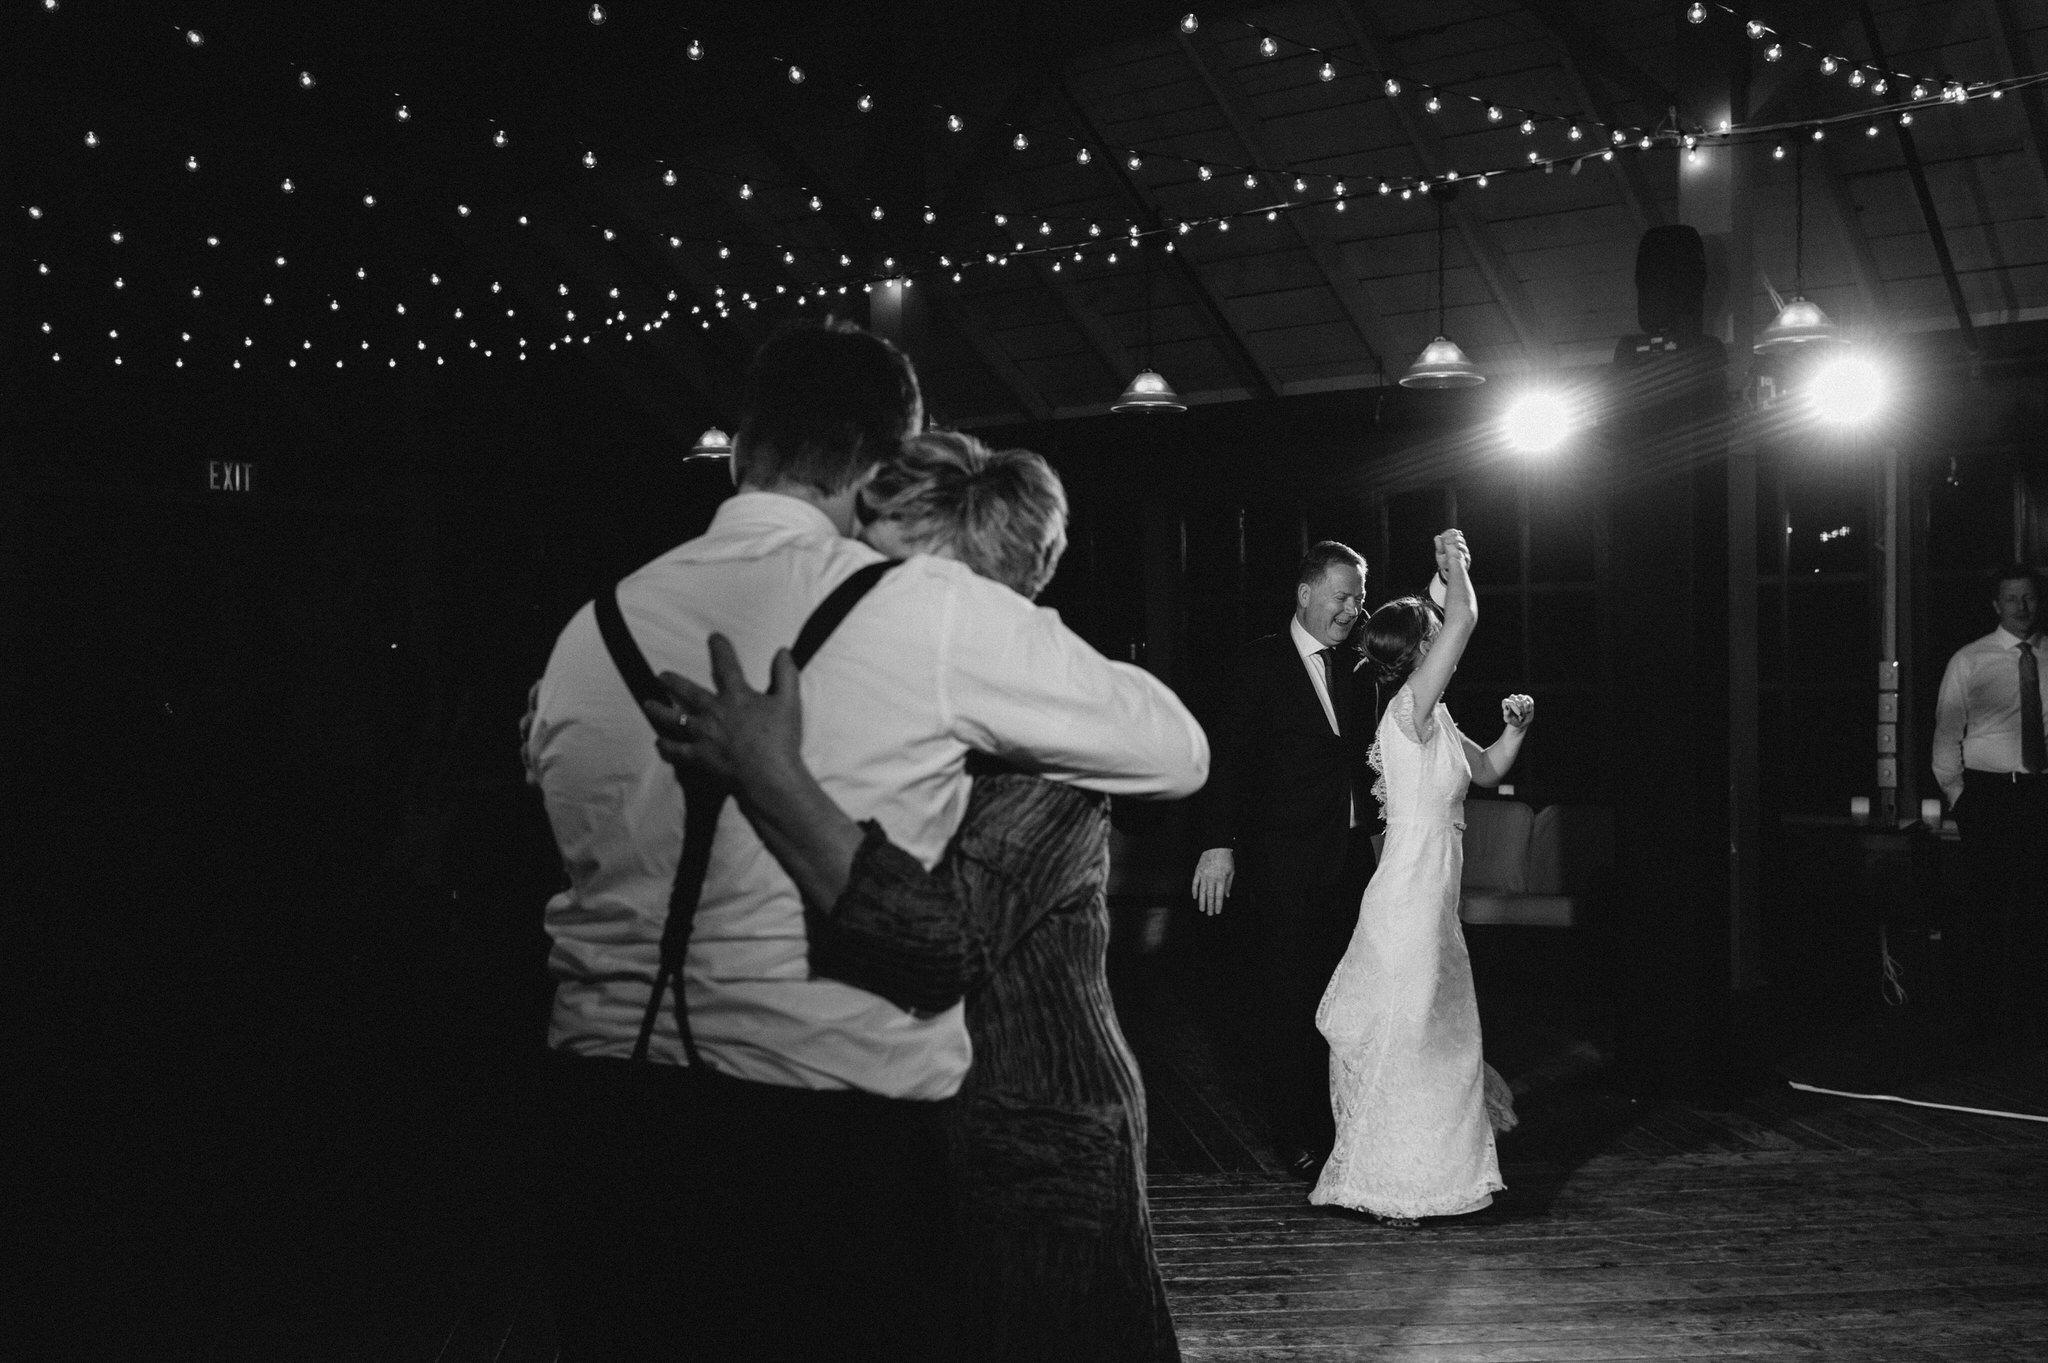 scarletoneillphotography_weddingphotography_prince edward county weddings179.JPG